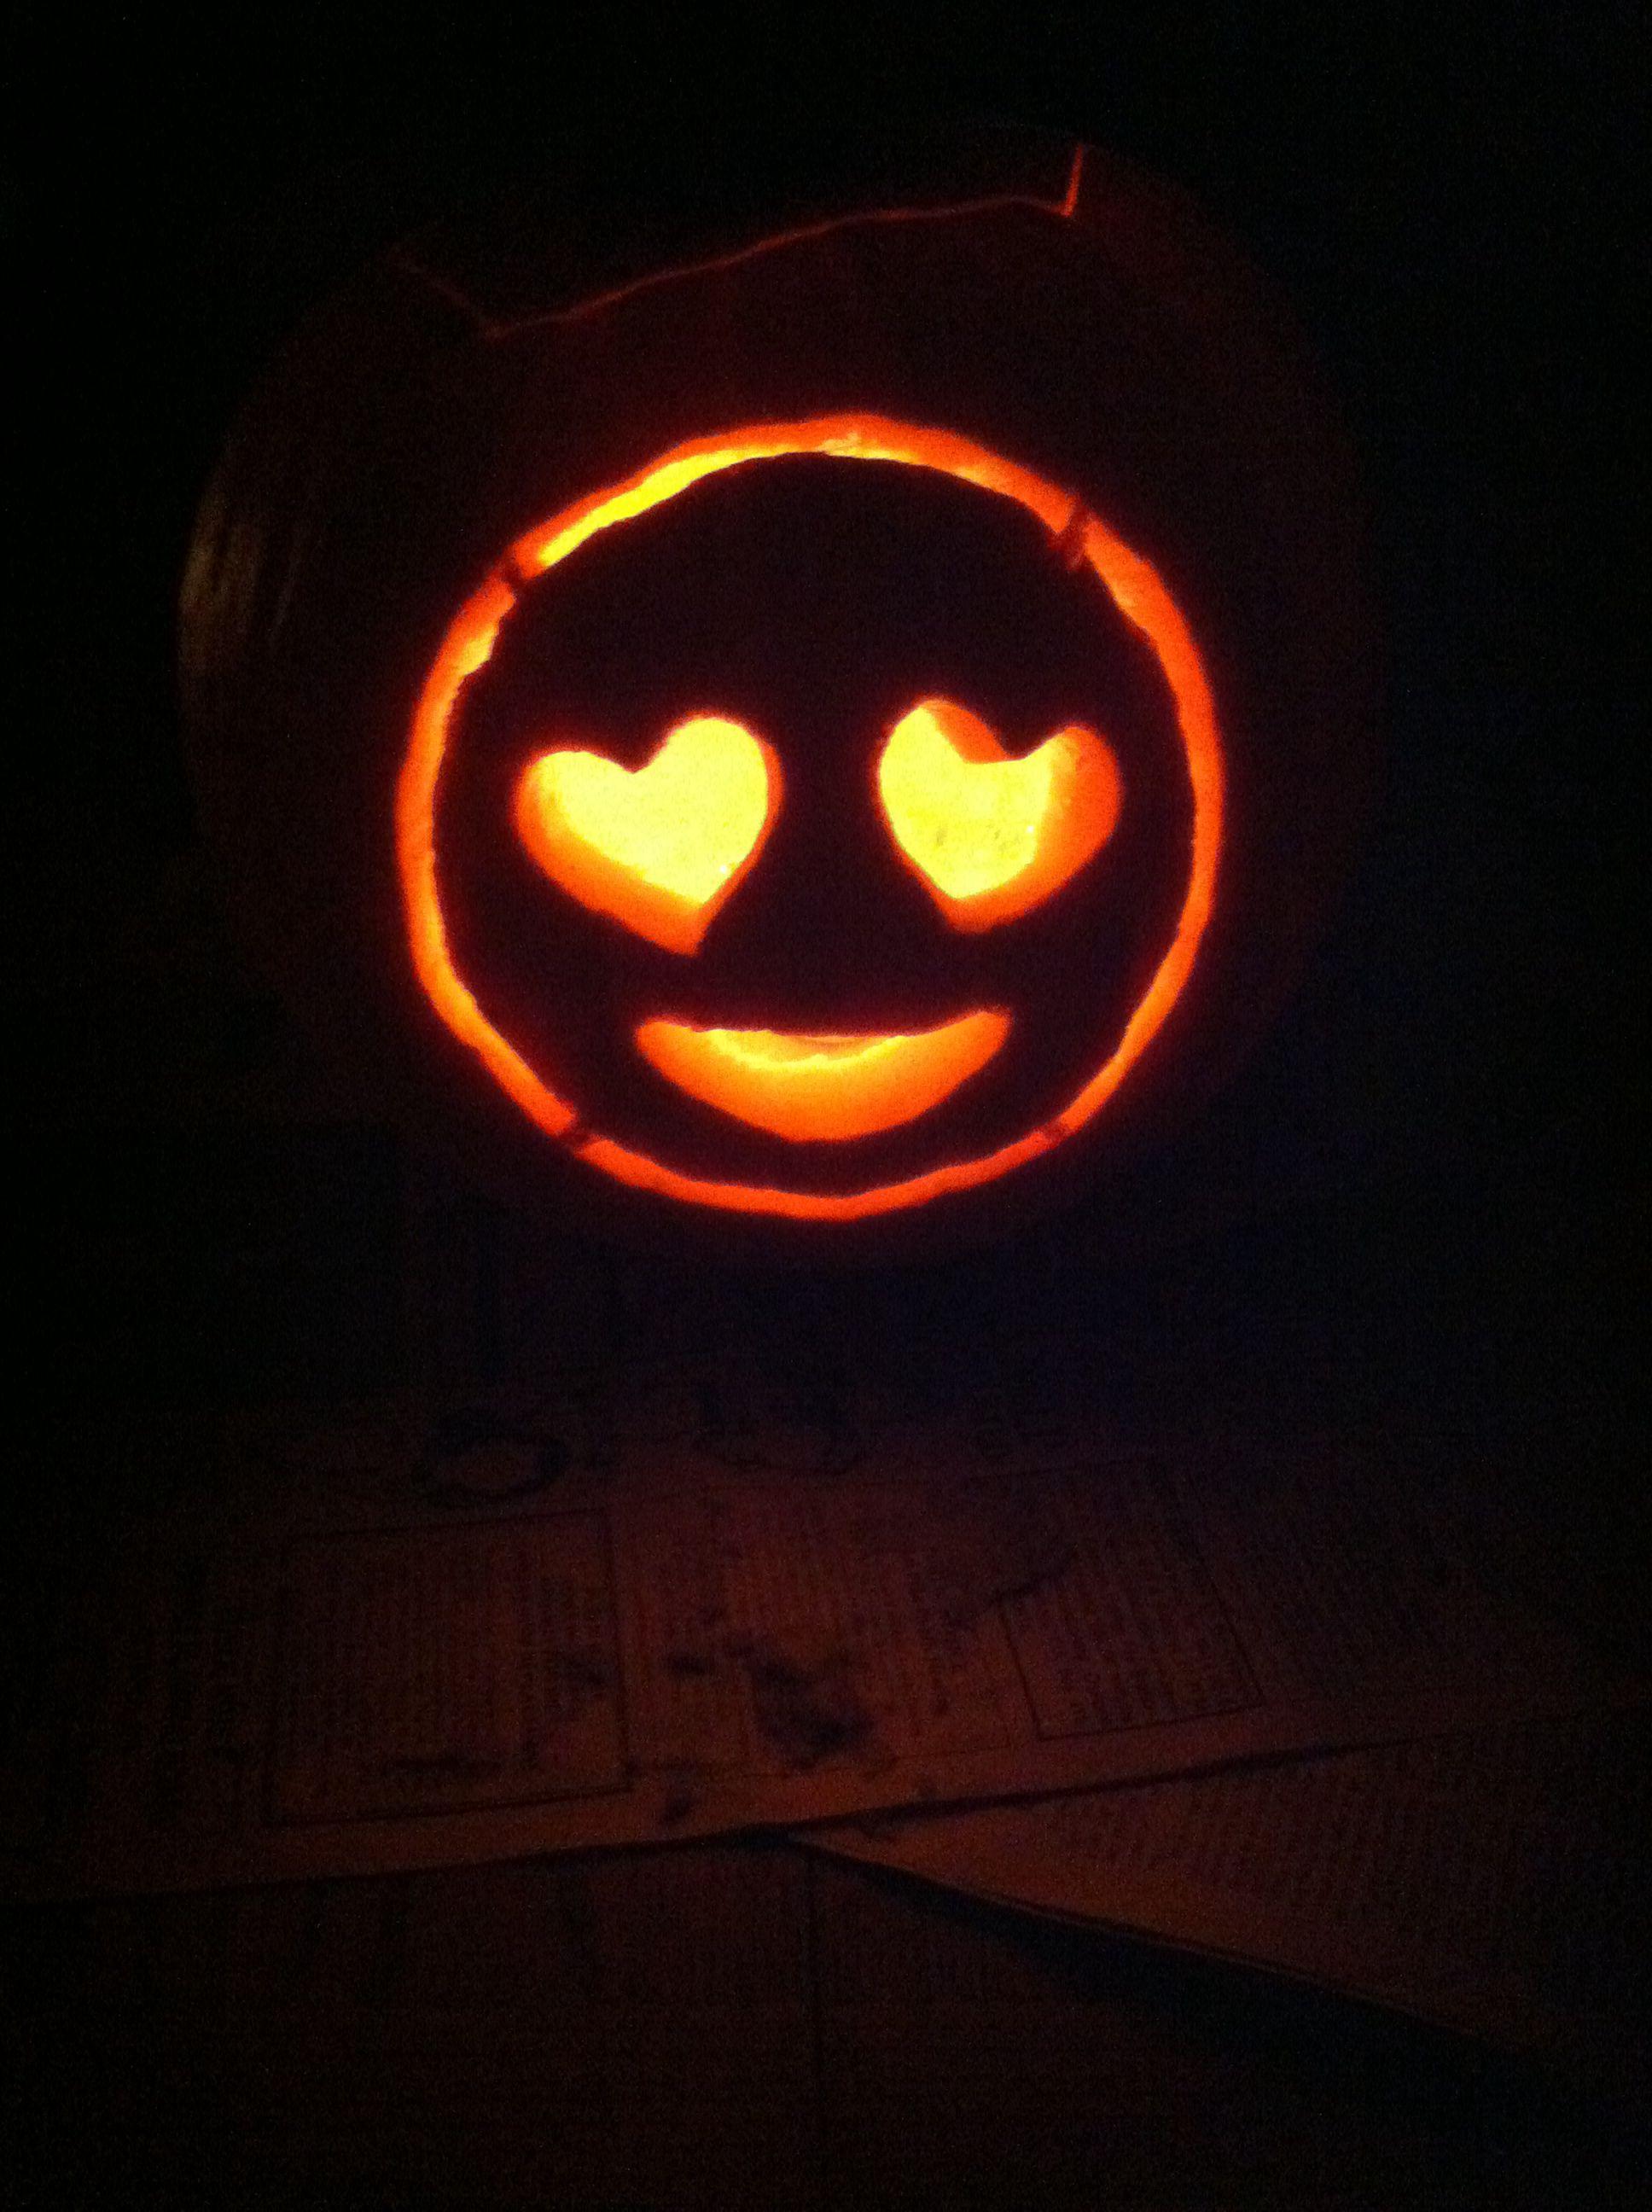 Emoji Halloween pumpkin 2014 Emoji pumpkin carving